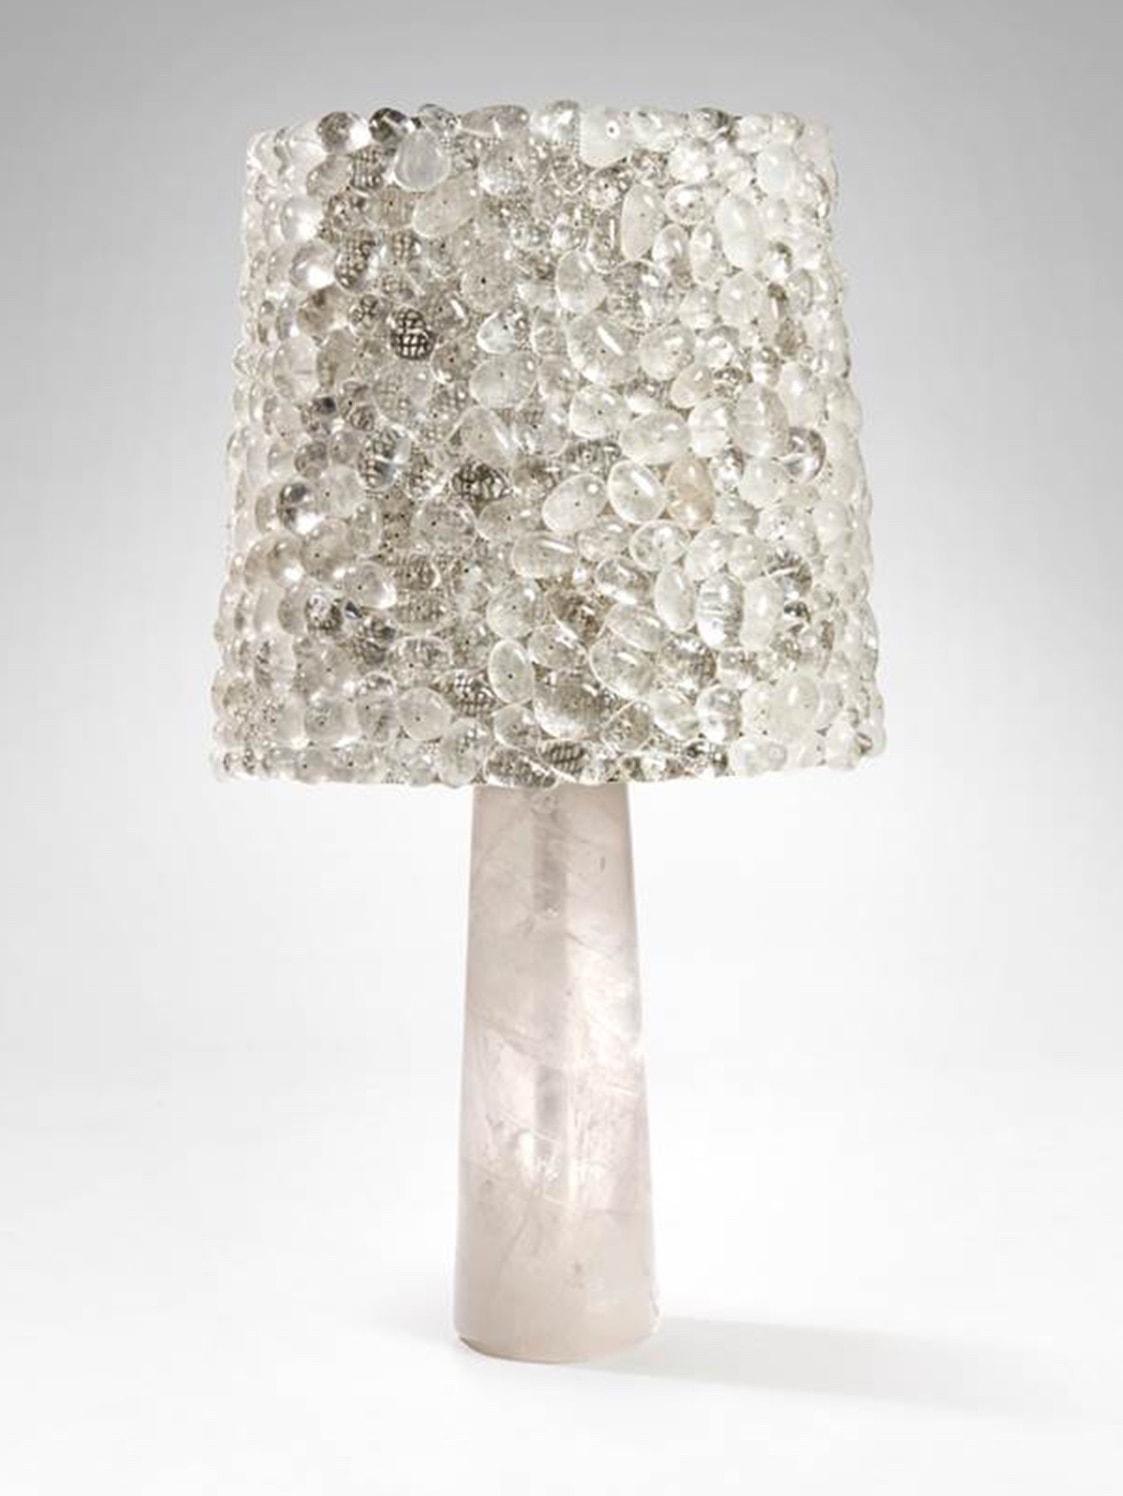 83 - Lampe Bonetti-squashed copie